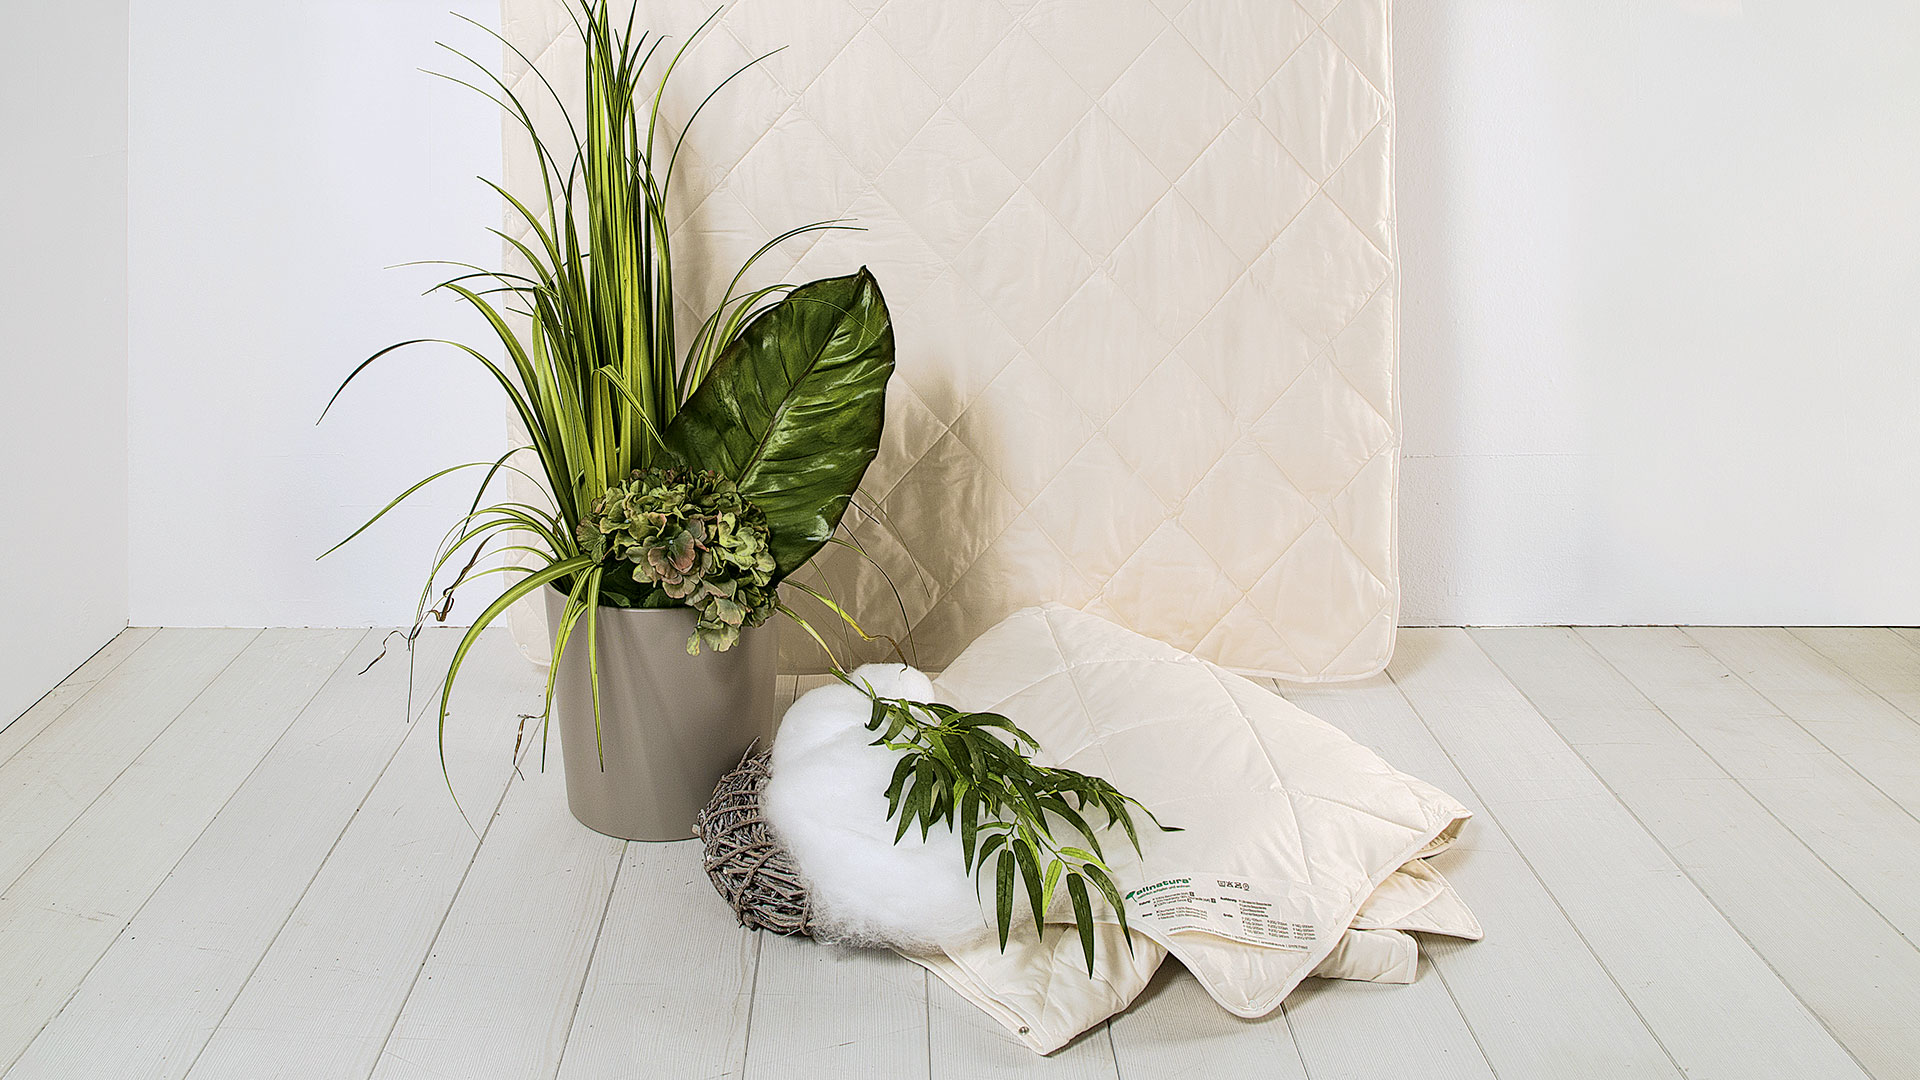 4 jahreszeiten bettdecke lyovita aus lyocell tencel f r allergiker. Black Bedroom Furniture Sets. Home Design Ideas